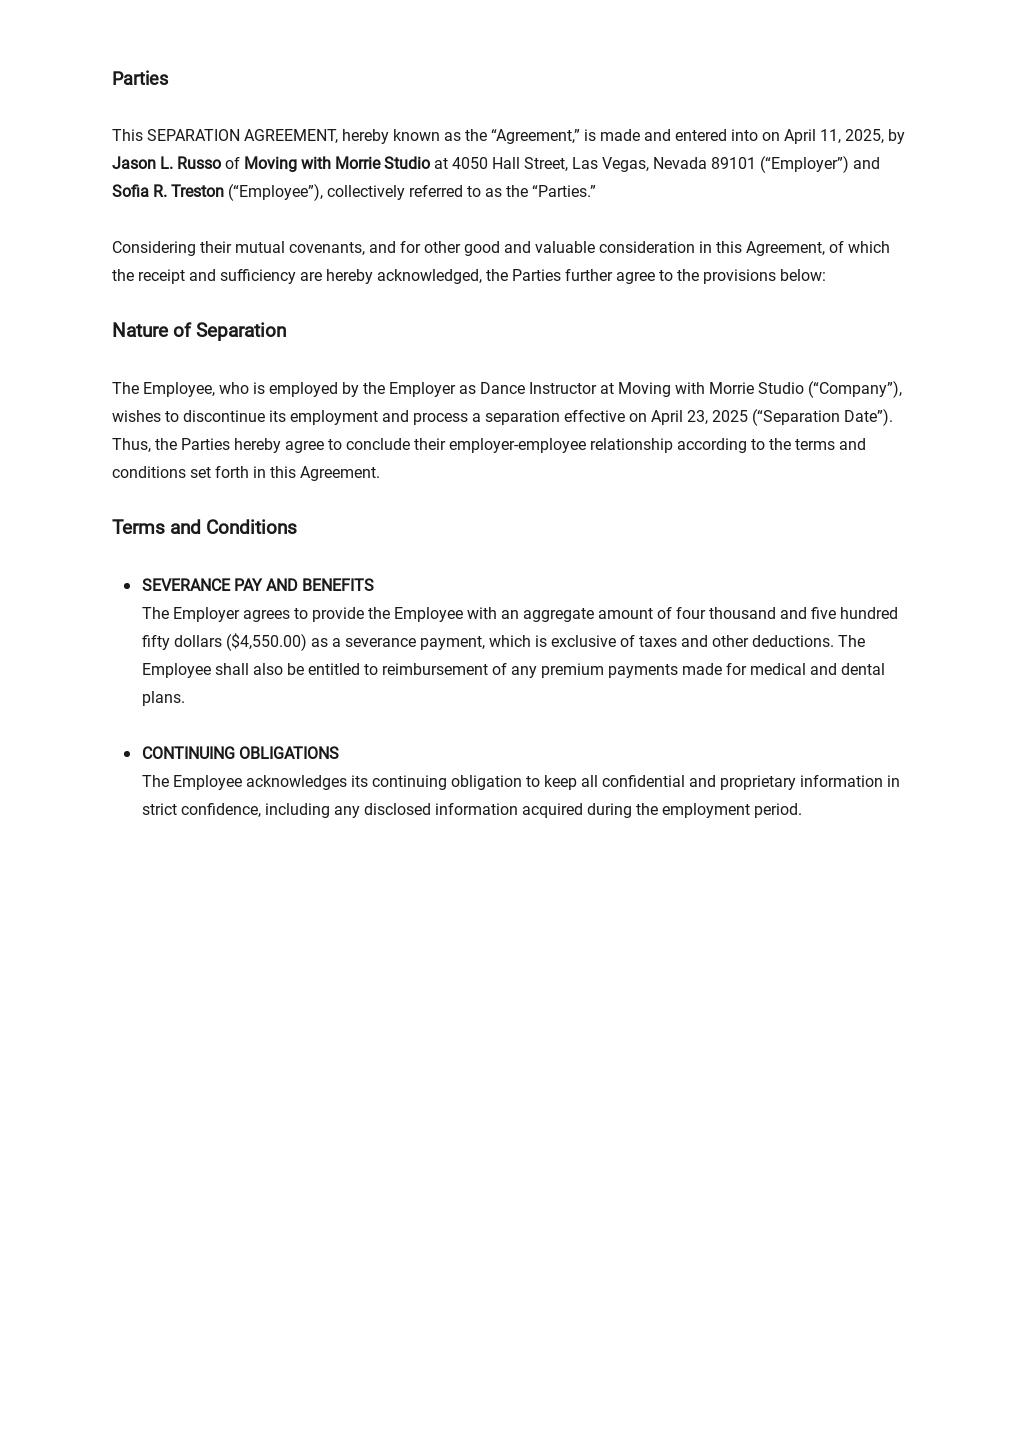 Separation Agreement Template 1.jpe